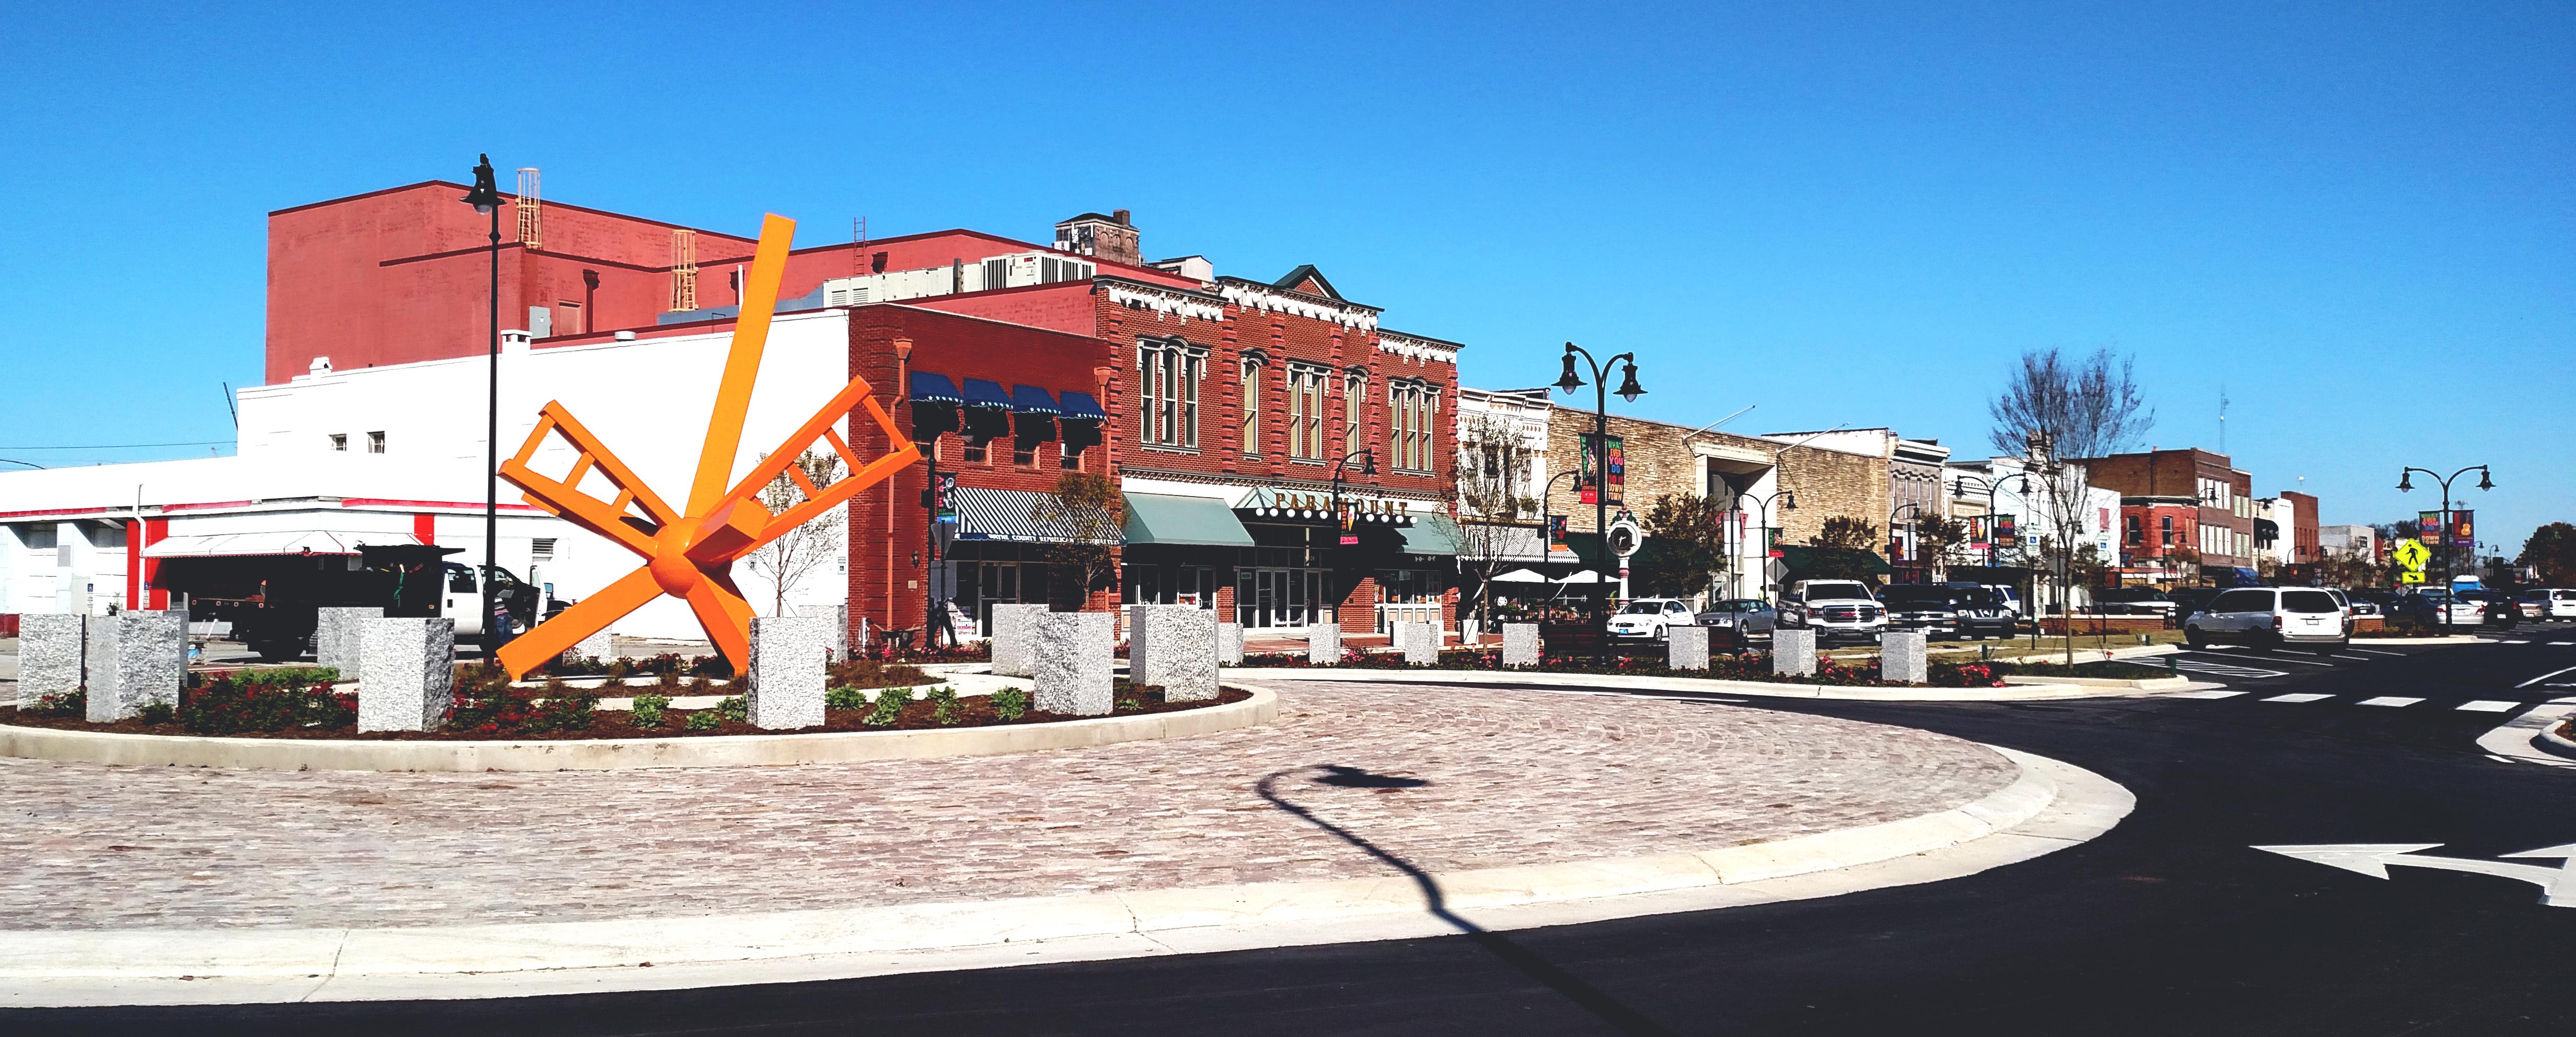 Downtown_goldsboro_streetscape